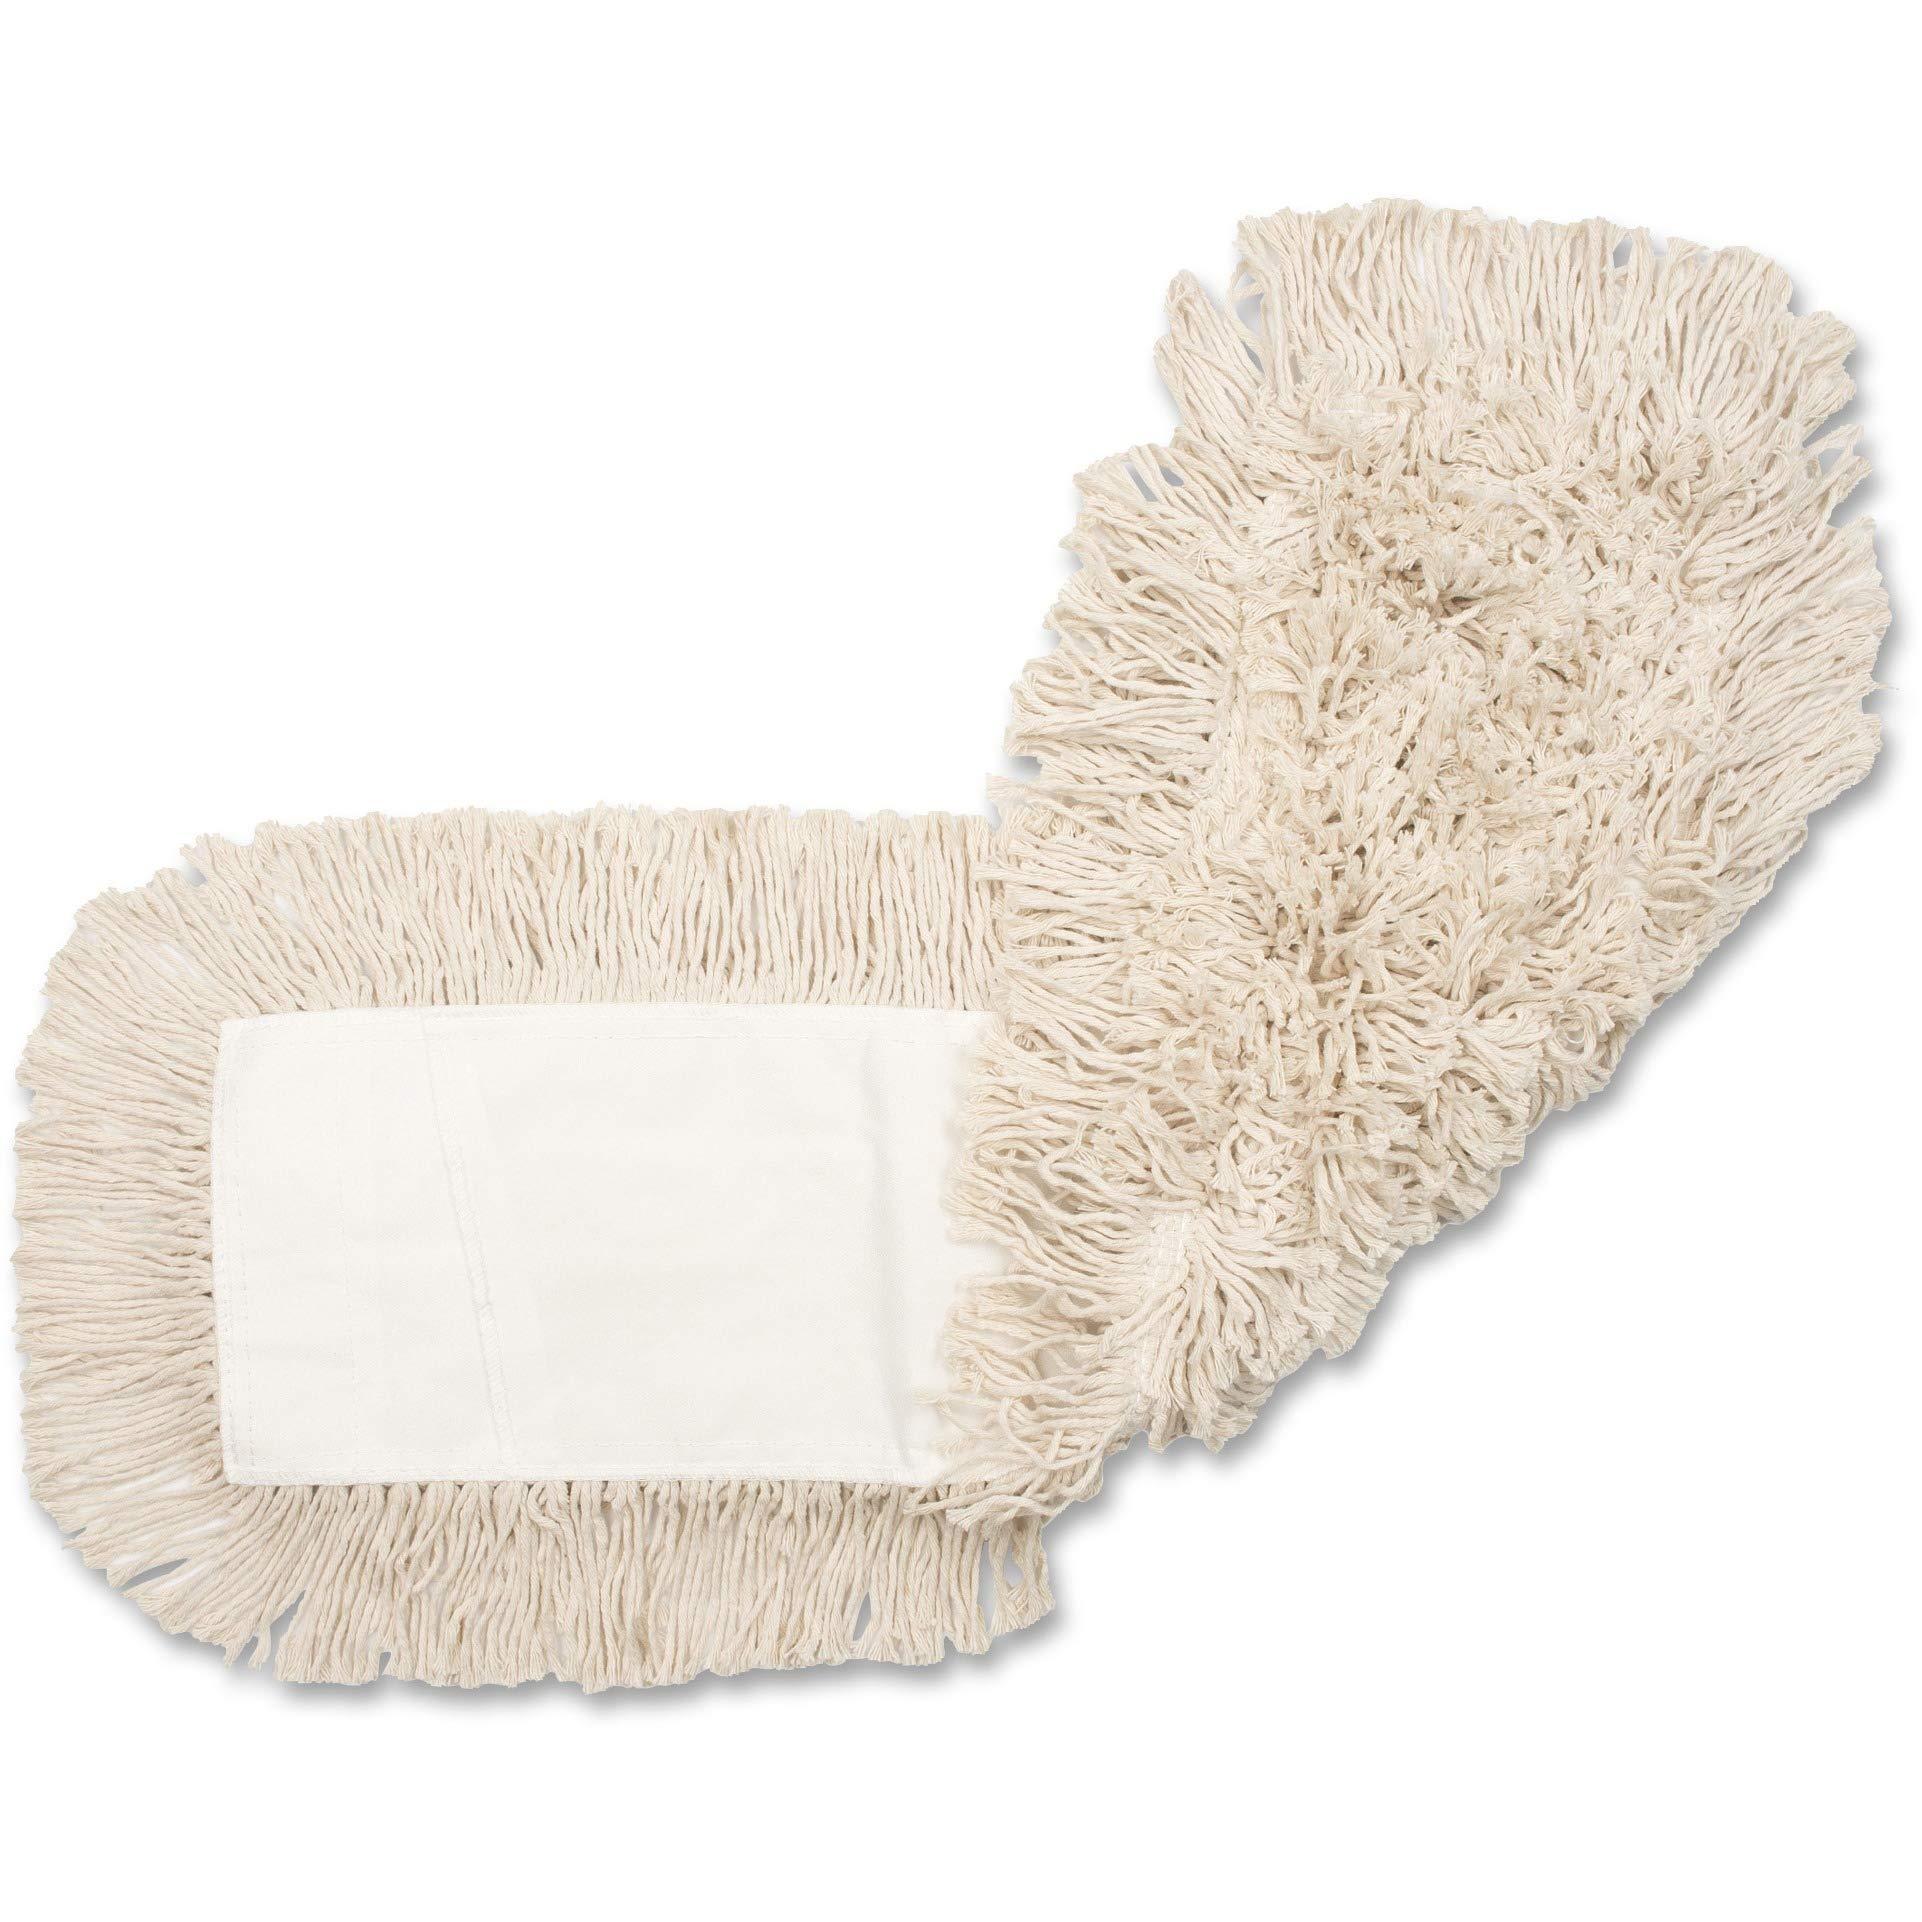 Genuine Joe GJO24500CT Disposable Cotton Dustmop Refill, 24''X5'', 12Ea/Ct, Natural (Pack of 12)